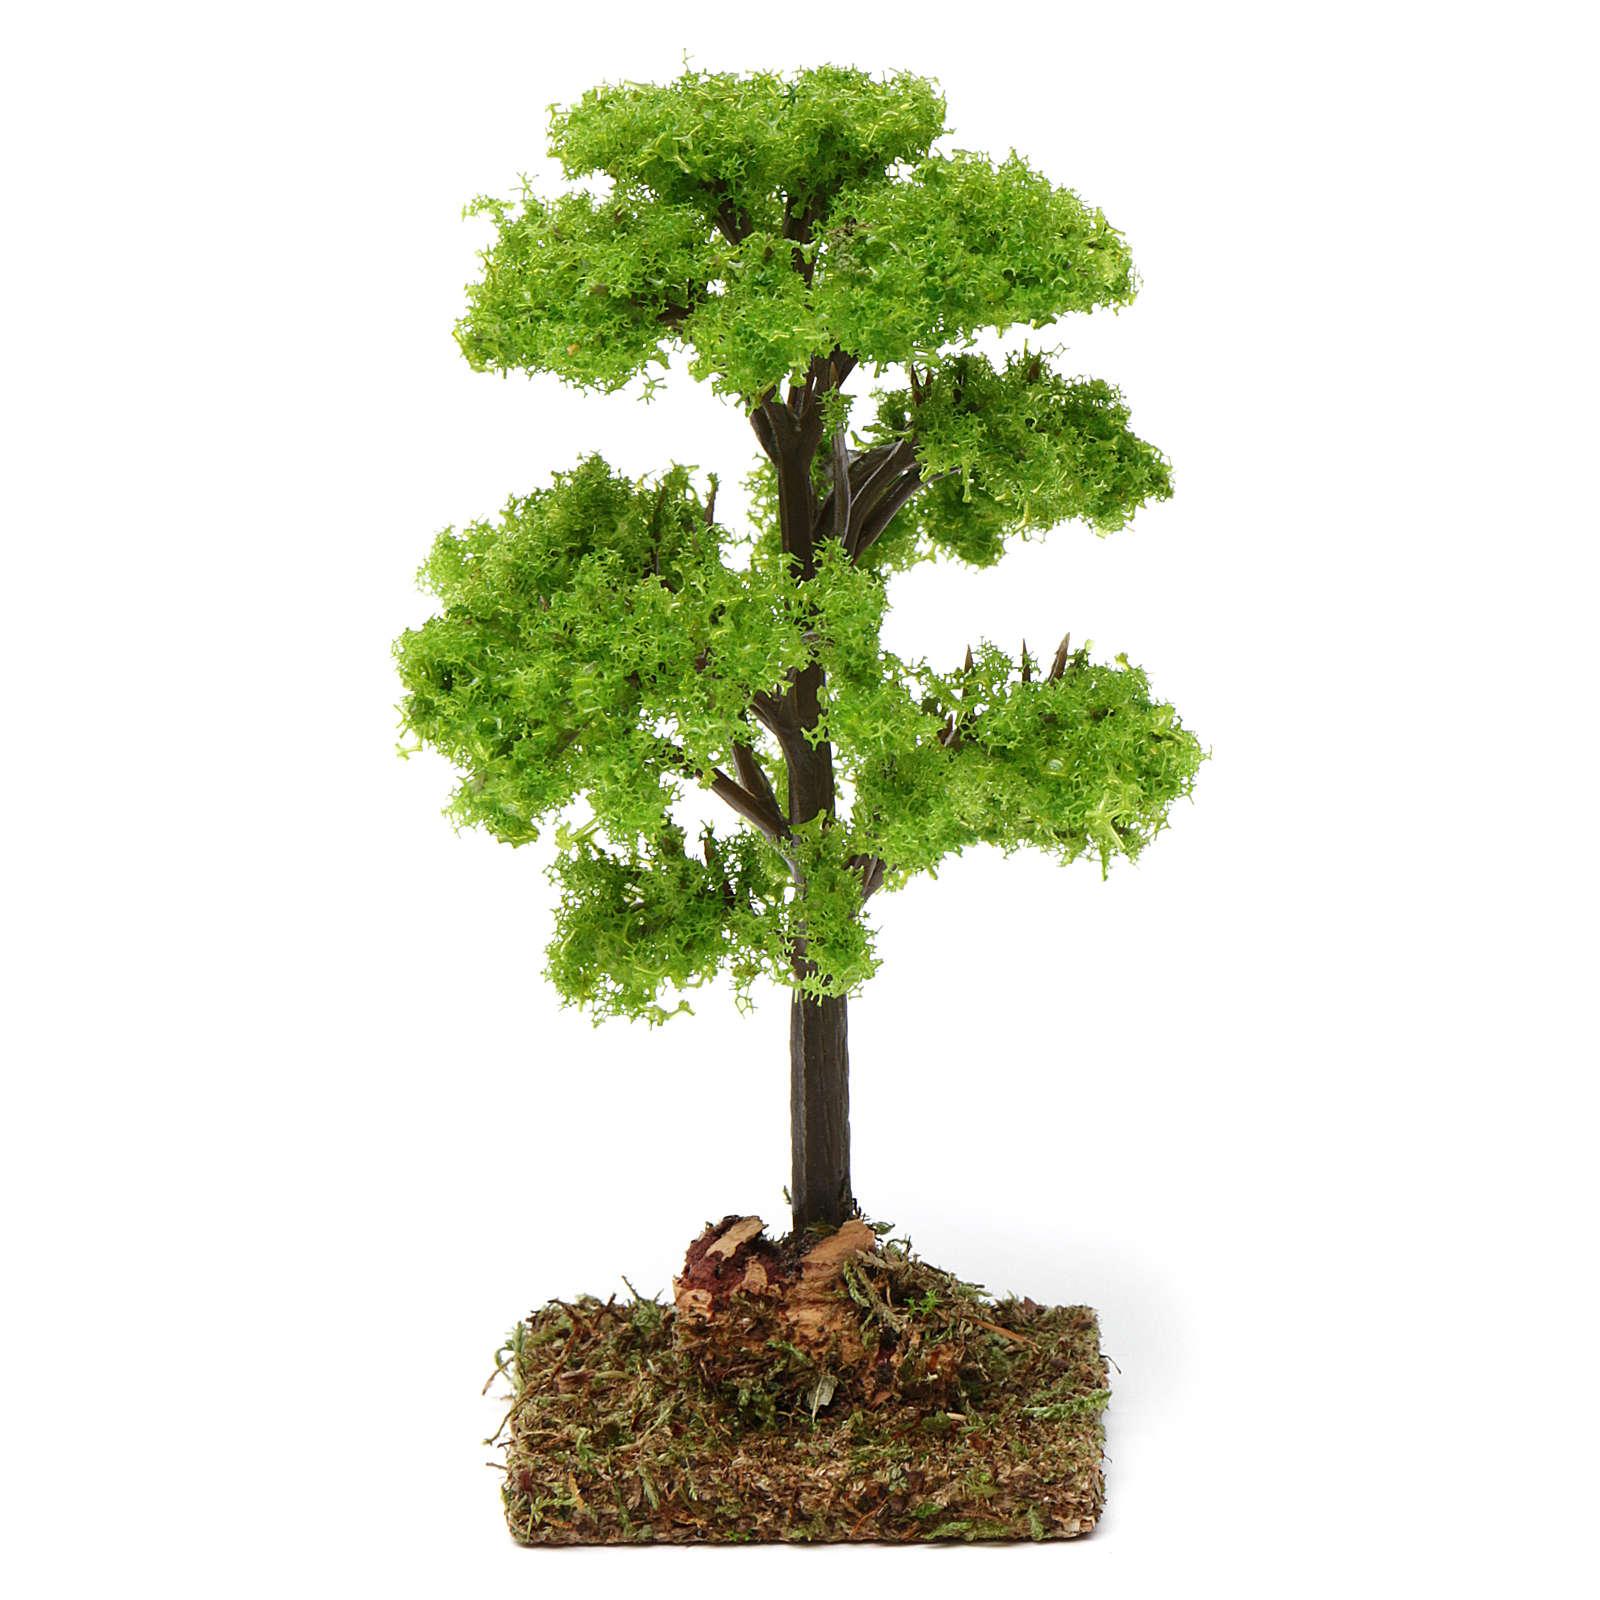 Green tree for Nativity Scene 7-10 cm 4